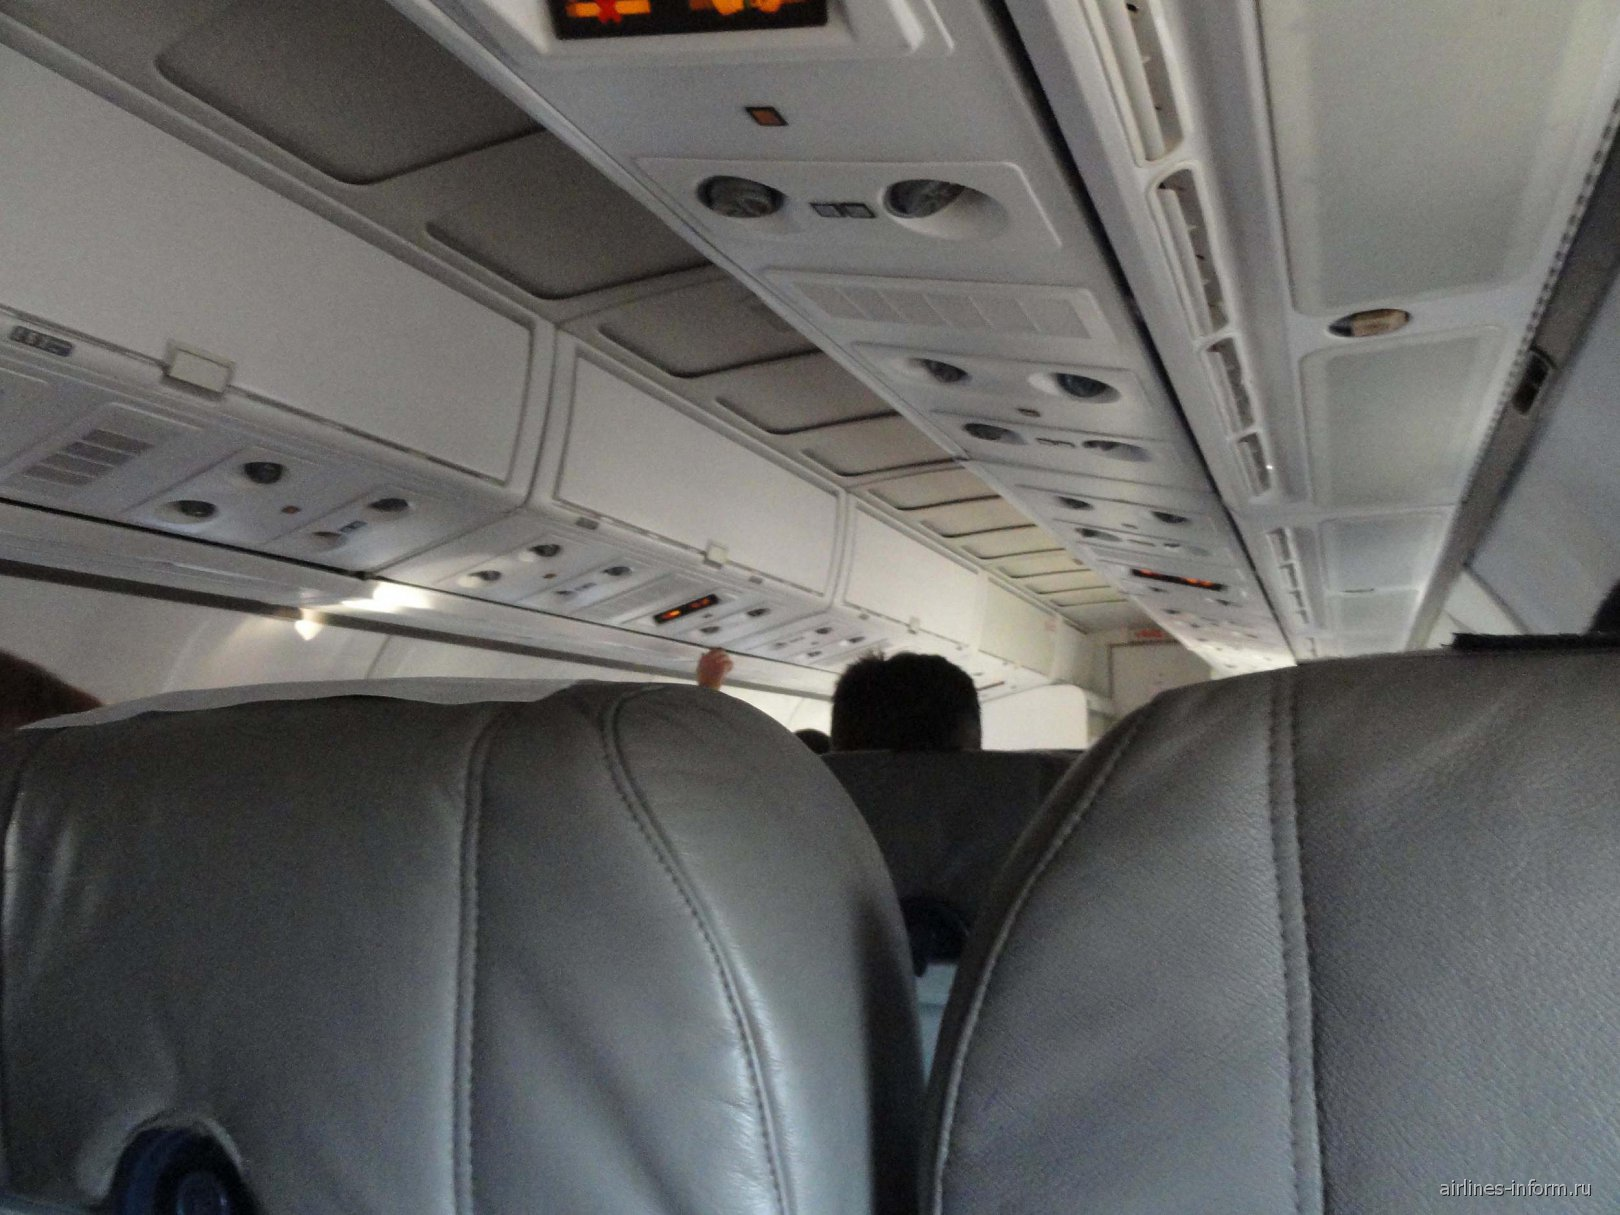 Салон самолета ATR 42 авиакомпании ЮТэйр Украина